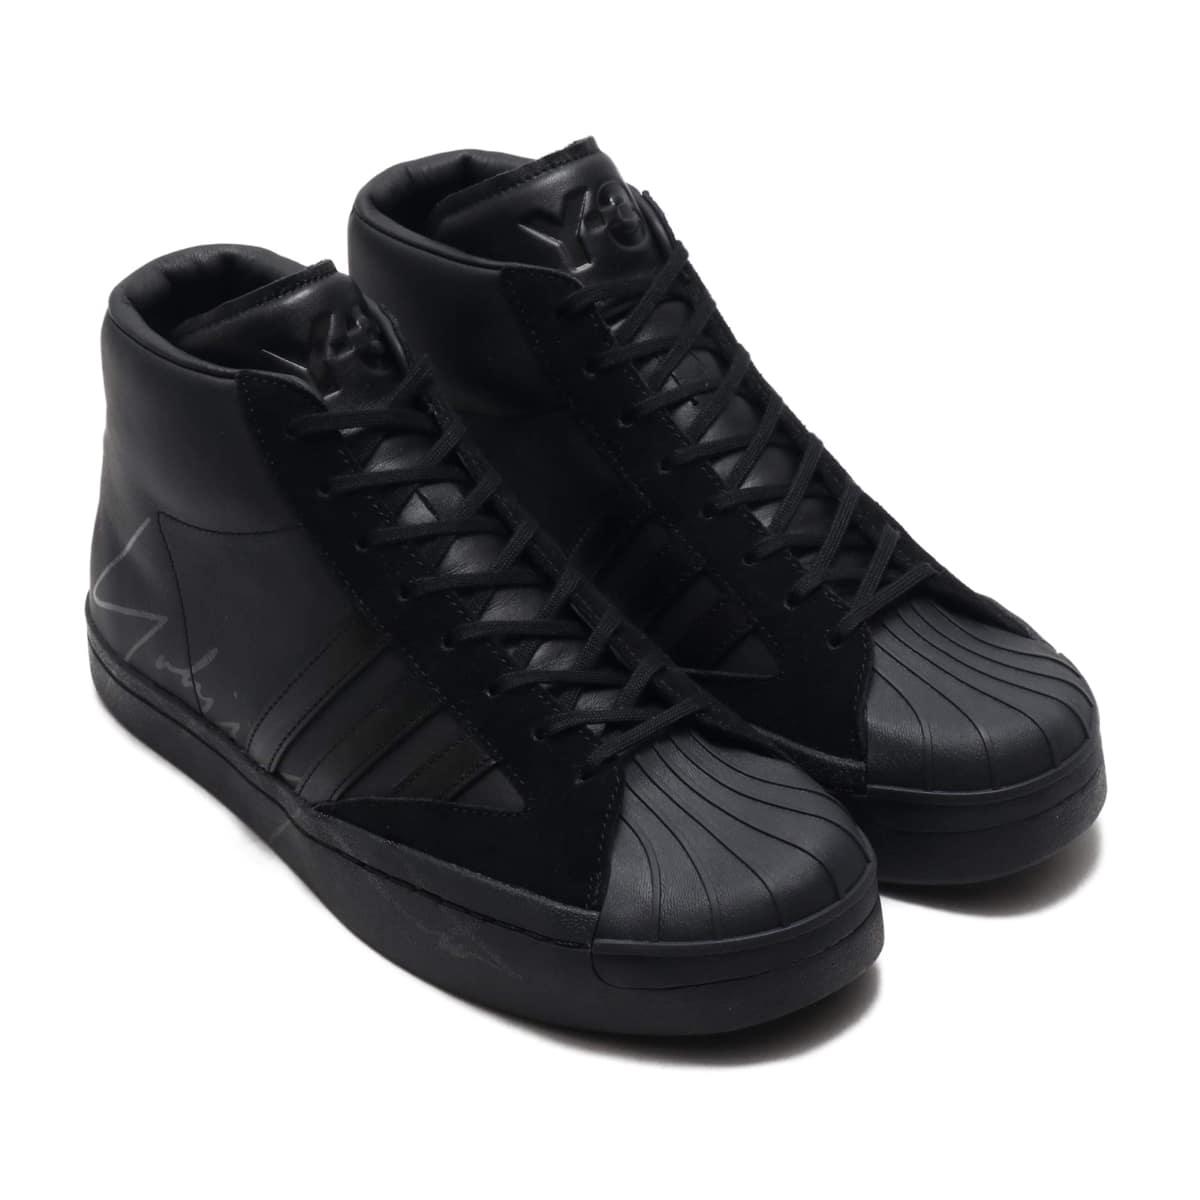 adidas Y-3 YOHJI PRO BLACK 20SS-S_photo_large